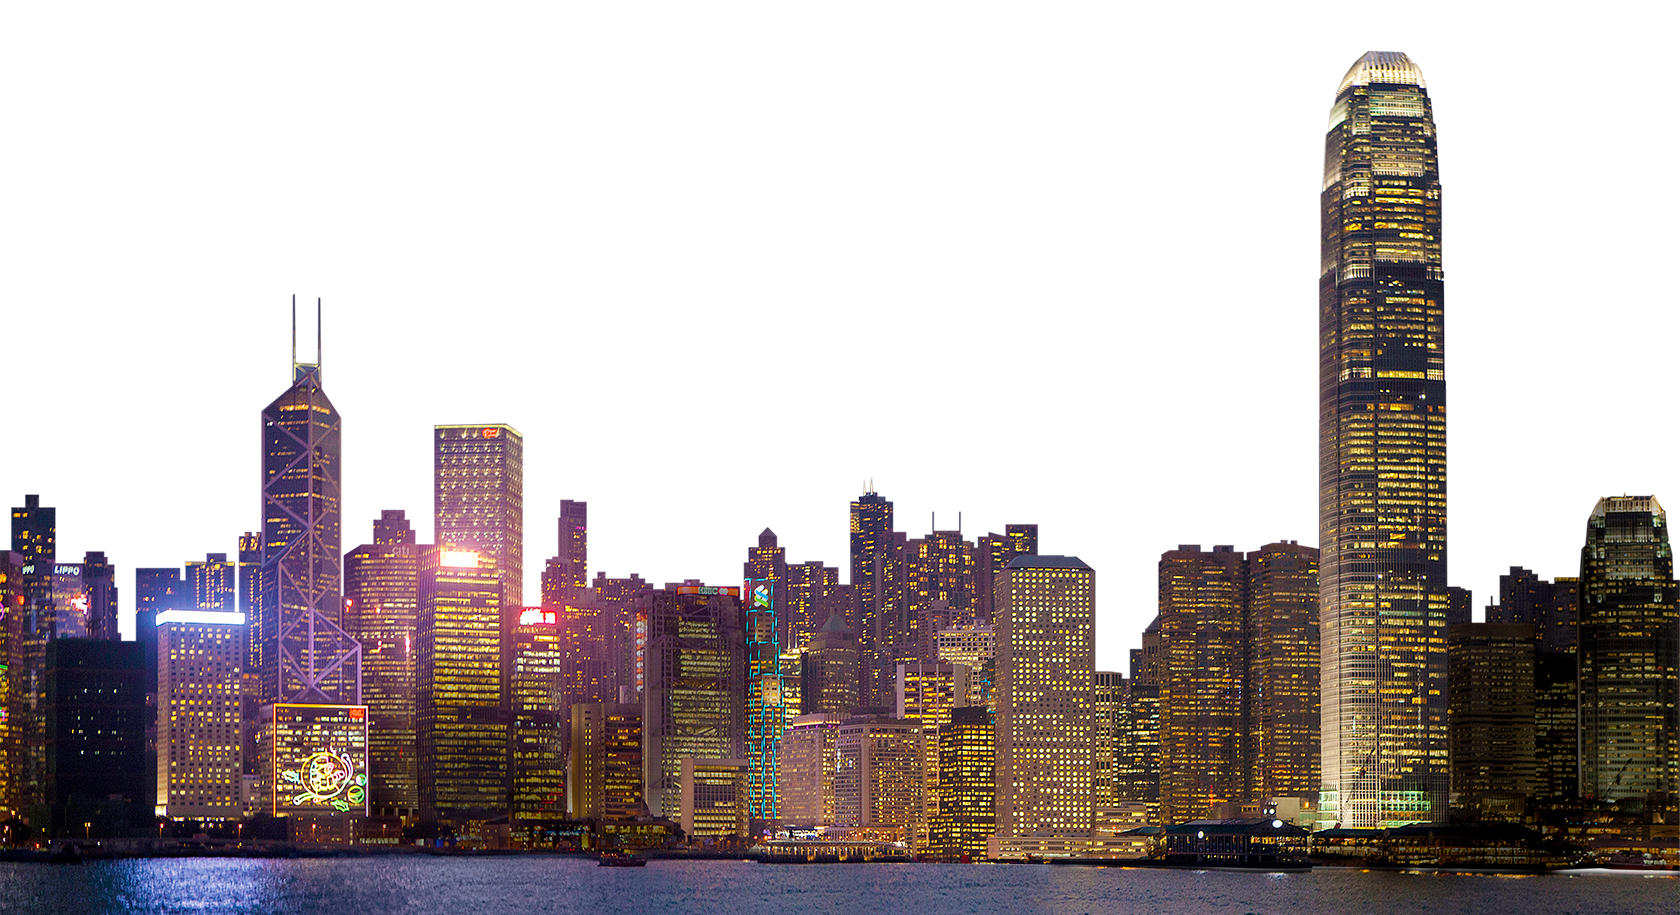 City At Night Skyline Png Image Night City Night Skyline Skyline